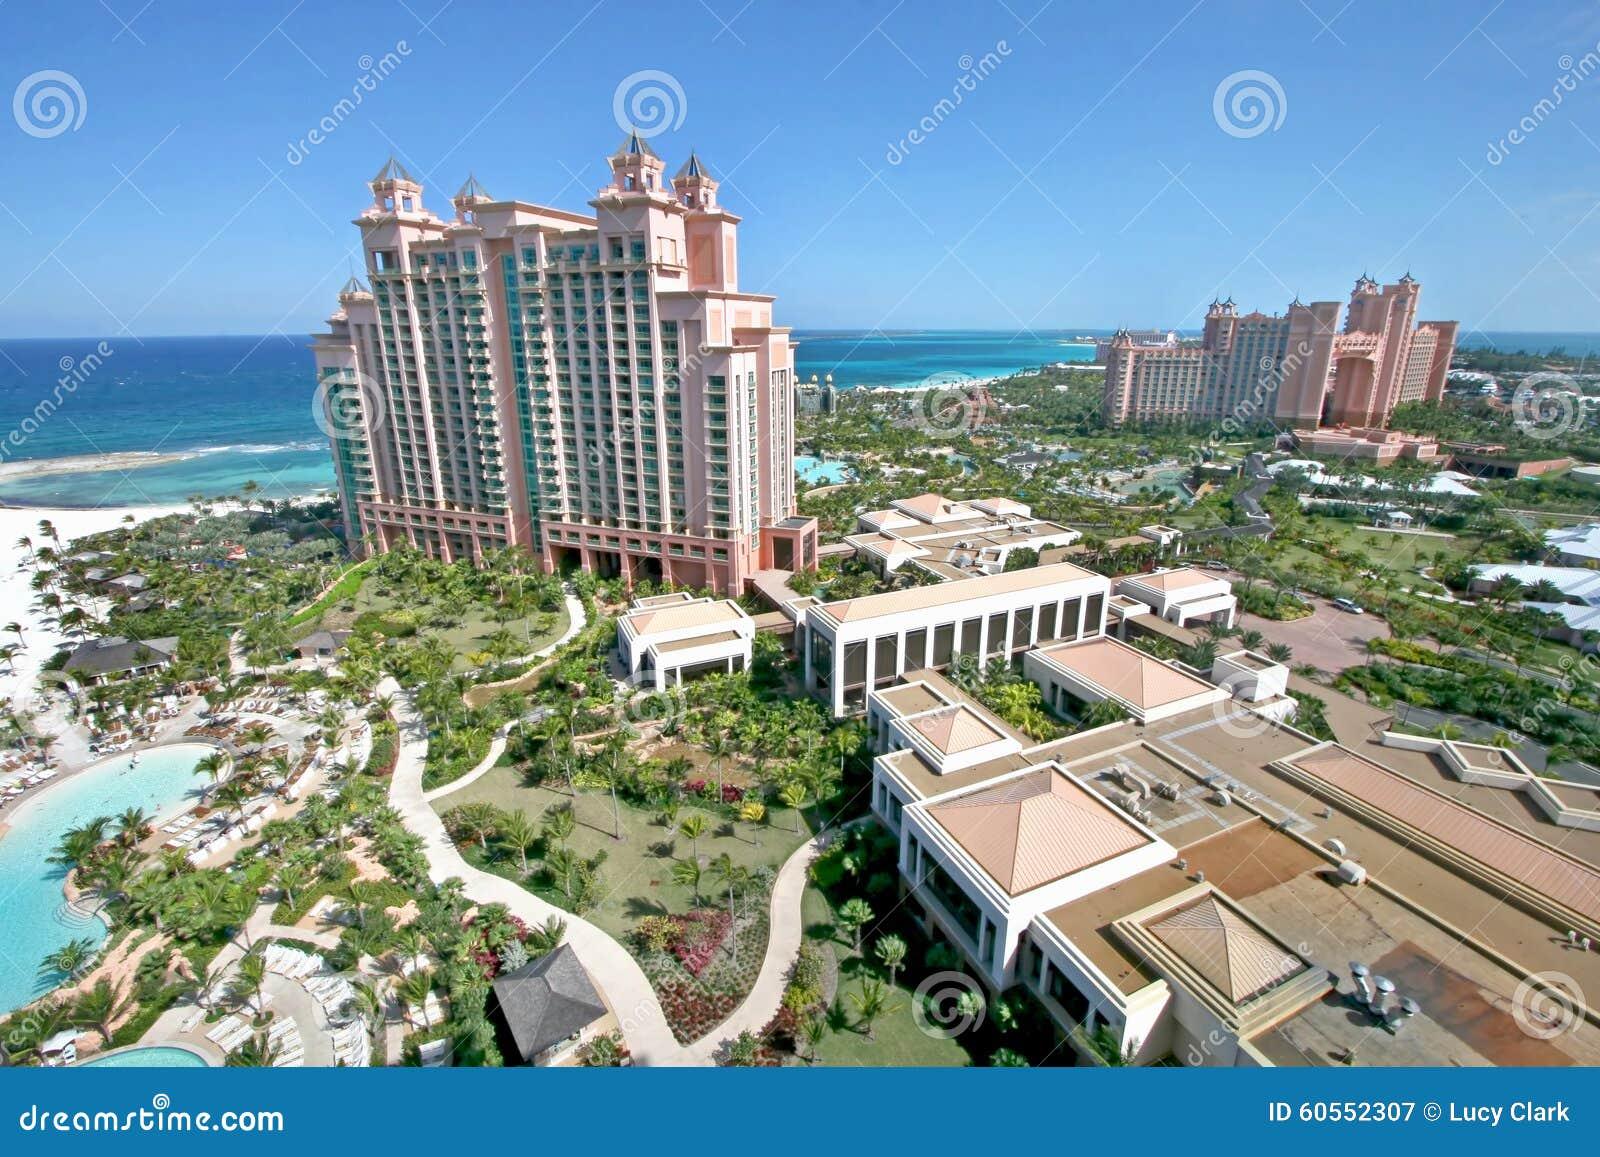 Atlantis Paradise Island Bahamas Editorial Photography Image Of Amusement Destination 60552307